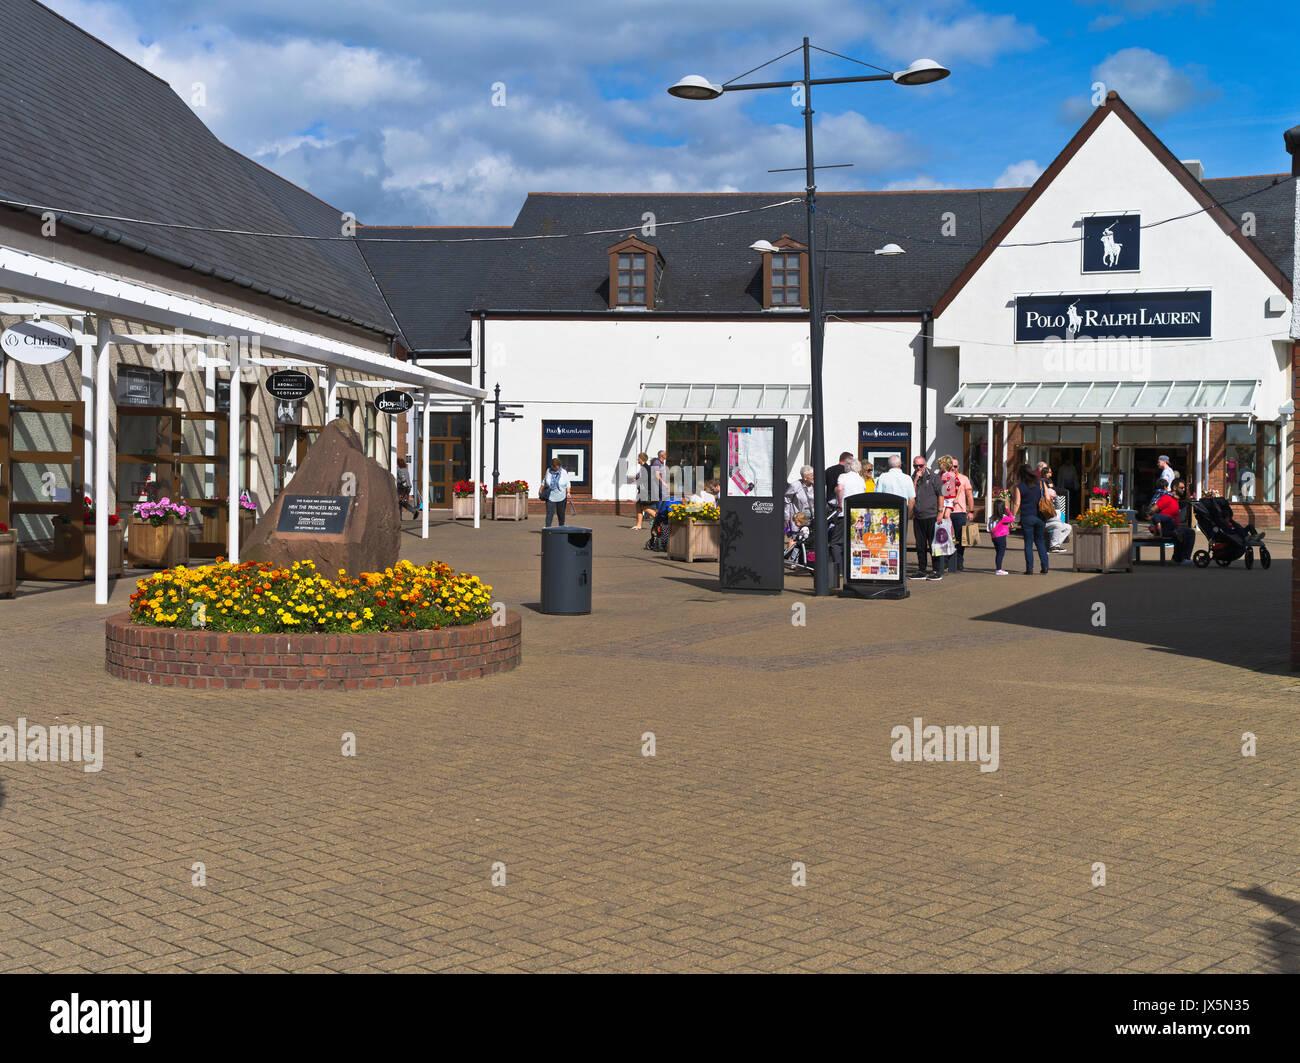 dh Gateway Outlet Village GRETNA GREEN DUMFRIES Polo Ralph Lauren Factory  Store mall shops retail outlets shopping arcade 75e37f0e30